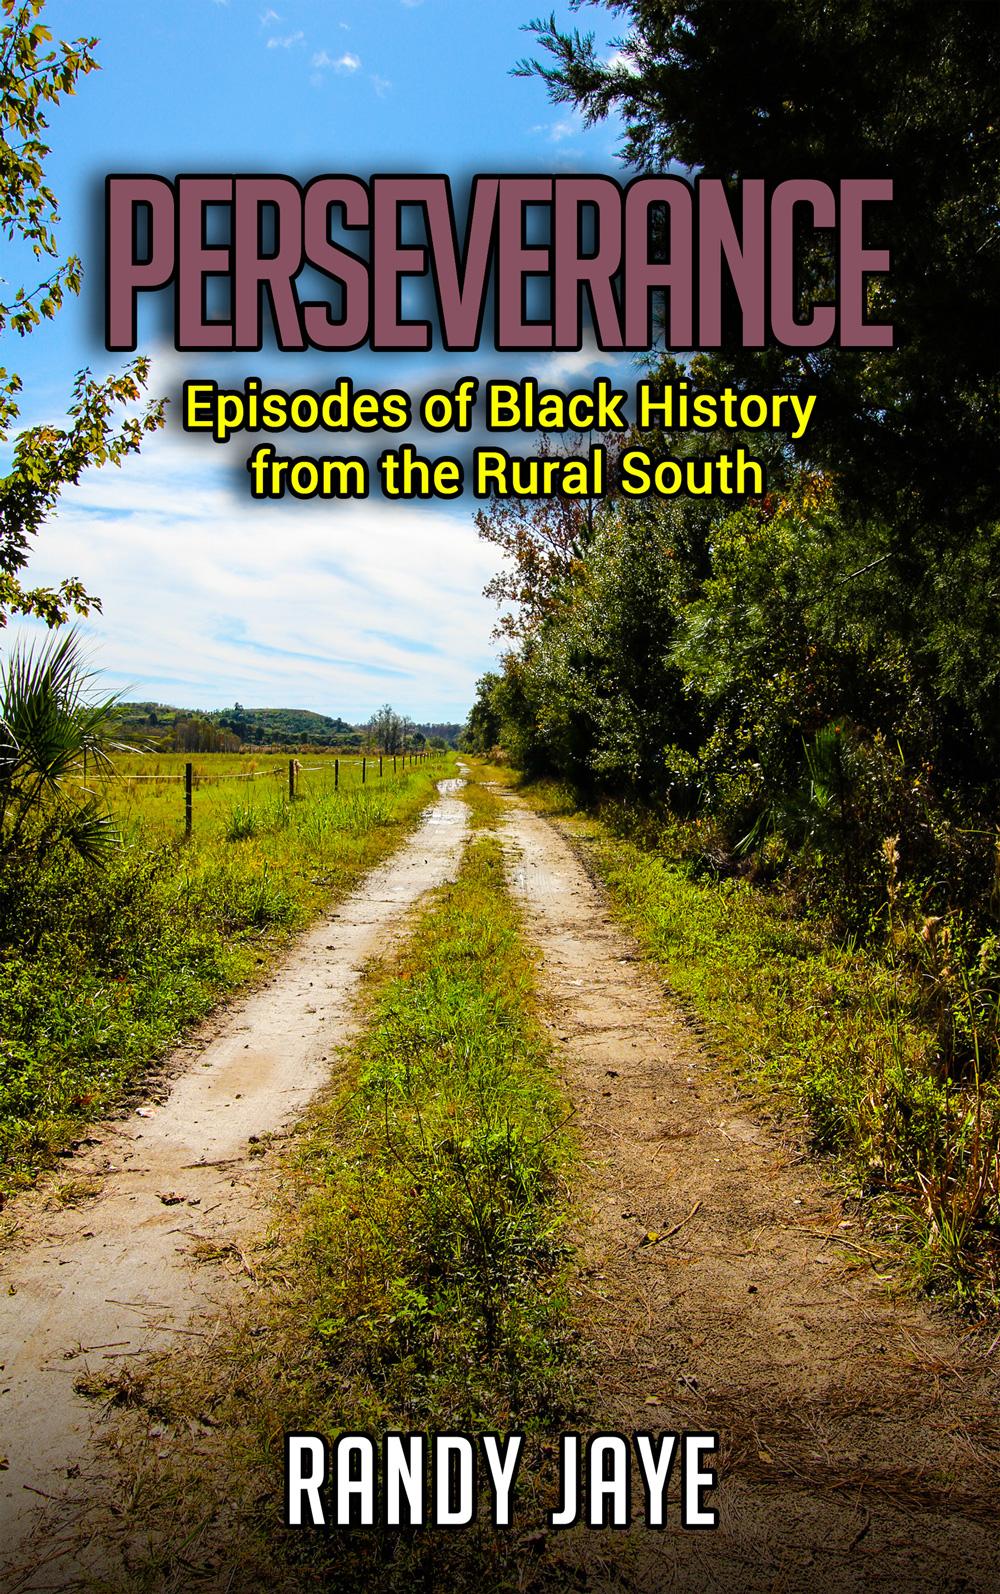 randy jaye book black history